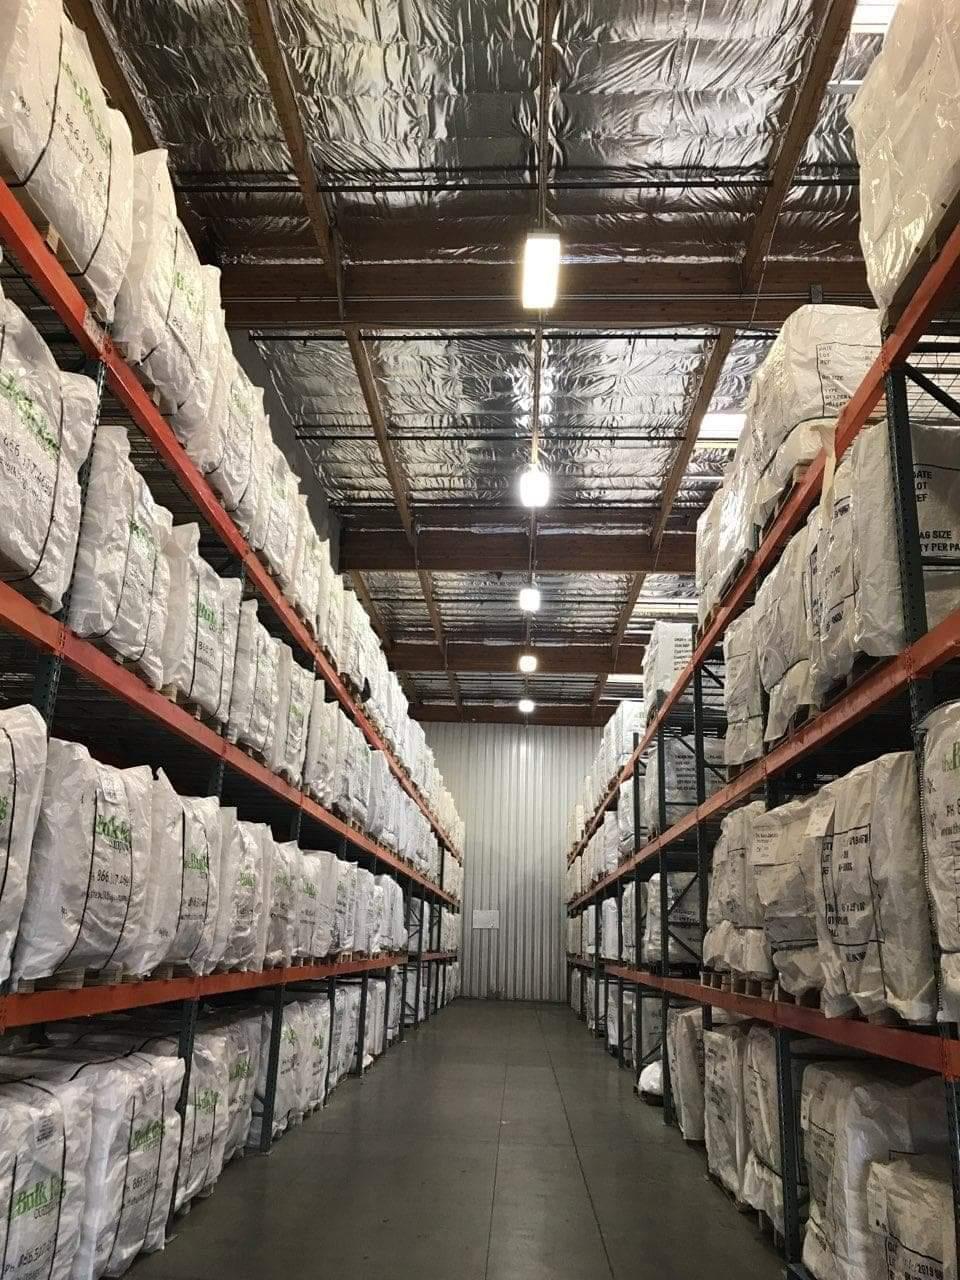 big bags in racking shelves